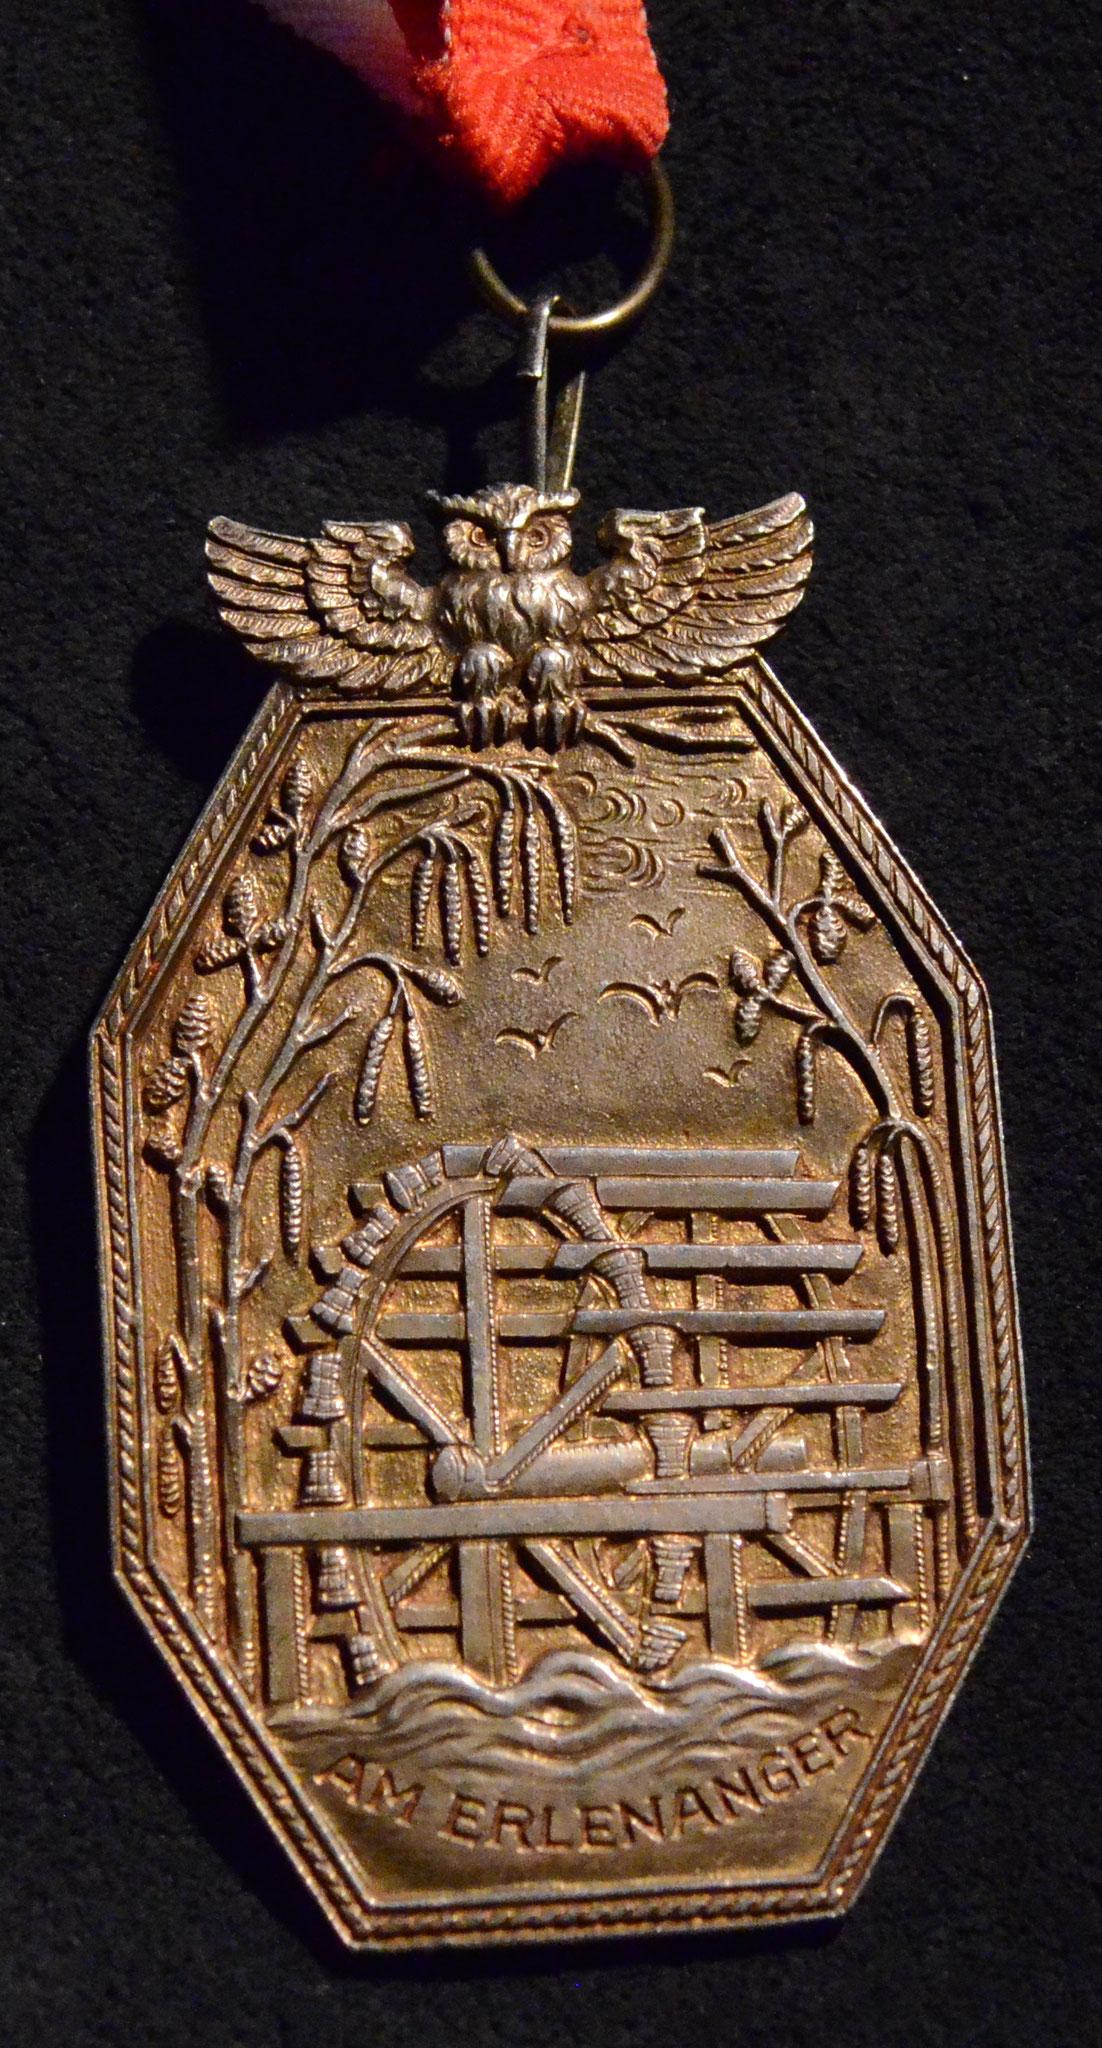 Wasserrad in Gold, Ausrittsorden, gest. Rt. Armin a.U. 97, 558. Sippung